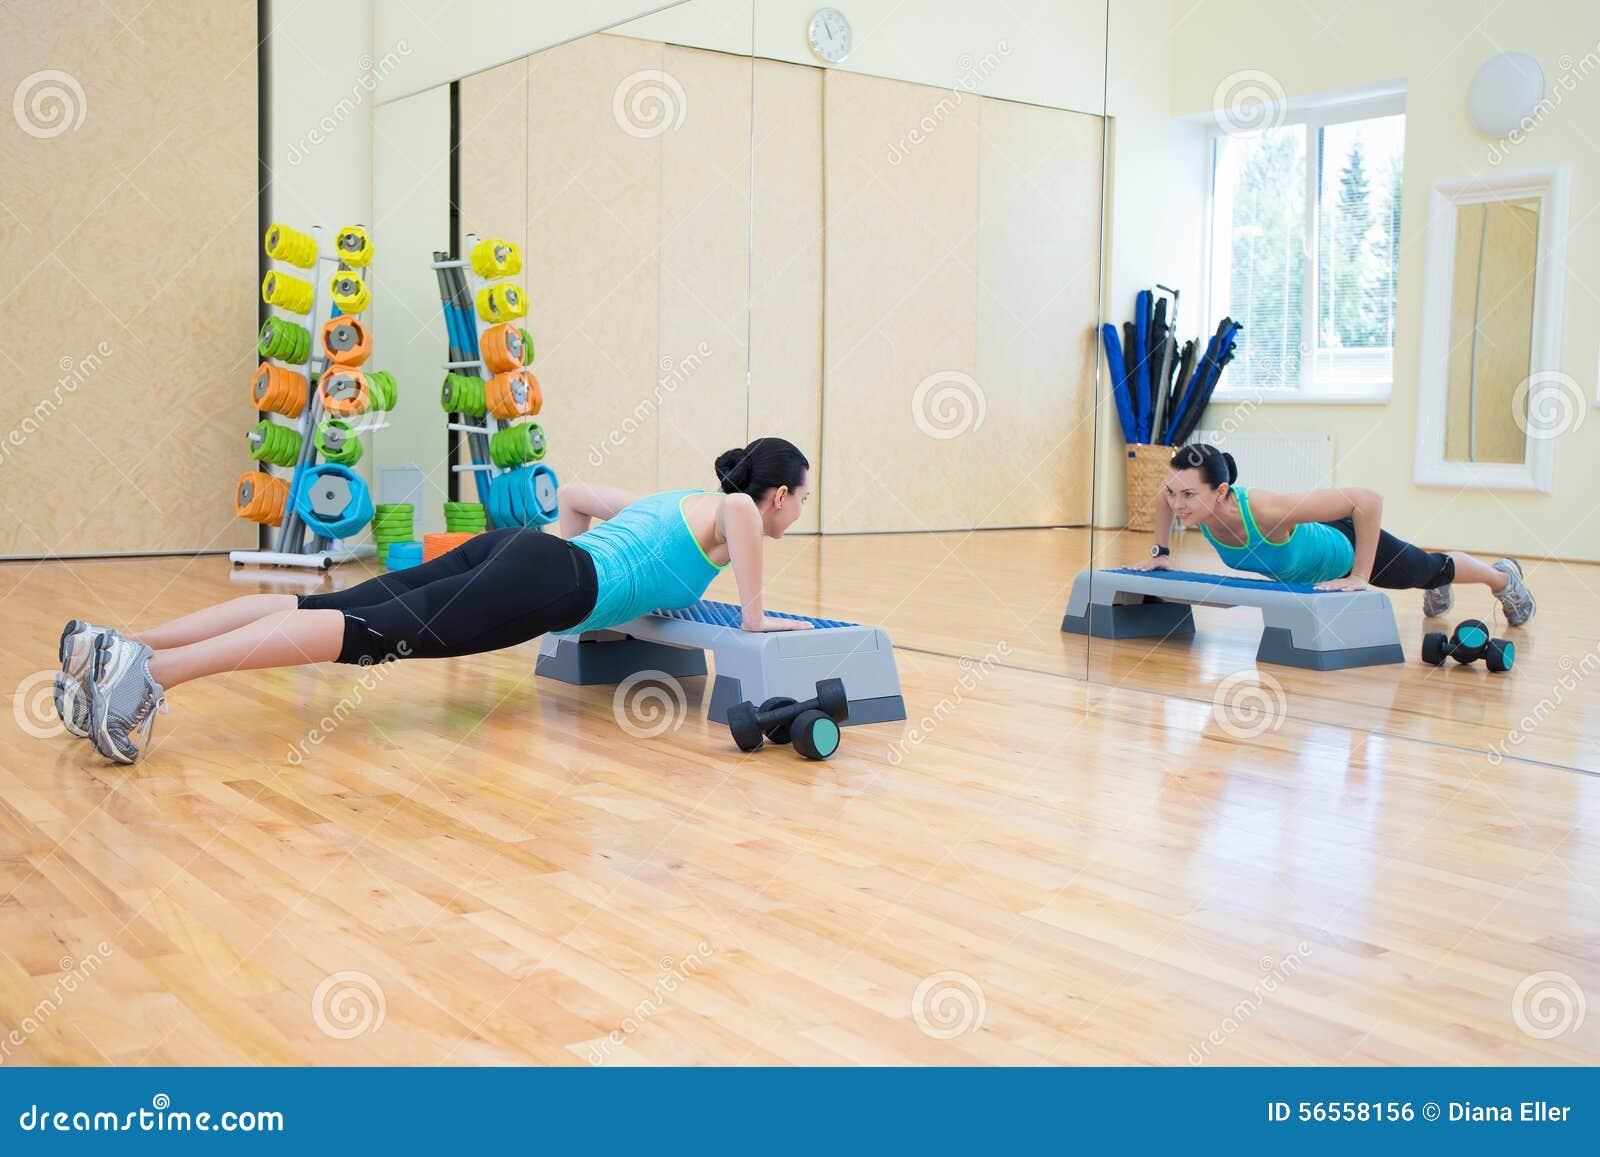 Download Όμορφη λεπτή γυναίκα που κάνει την ώθηση UPS με Stepper στη γυμναστική Στοκ Εικόνες - εικόνα από άνθρωποι, αθλητικό: 56558156